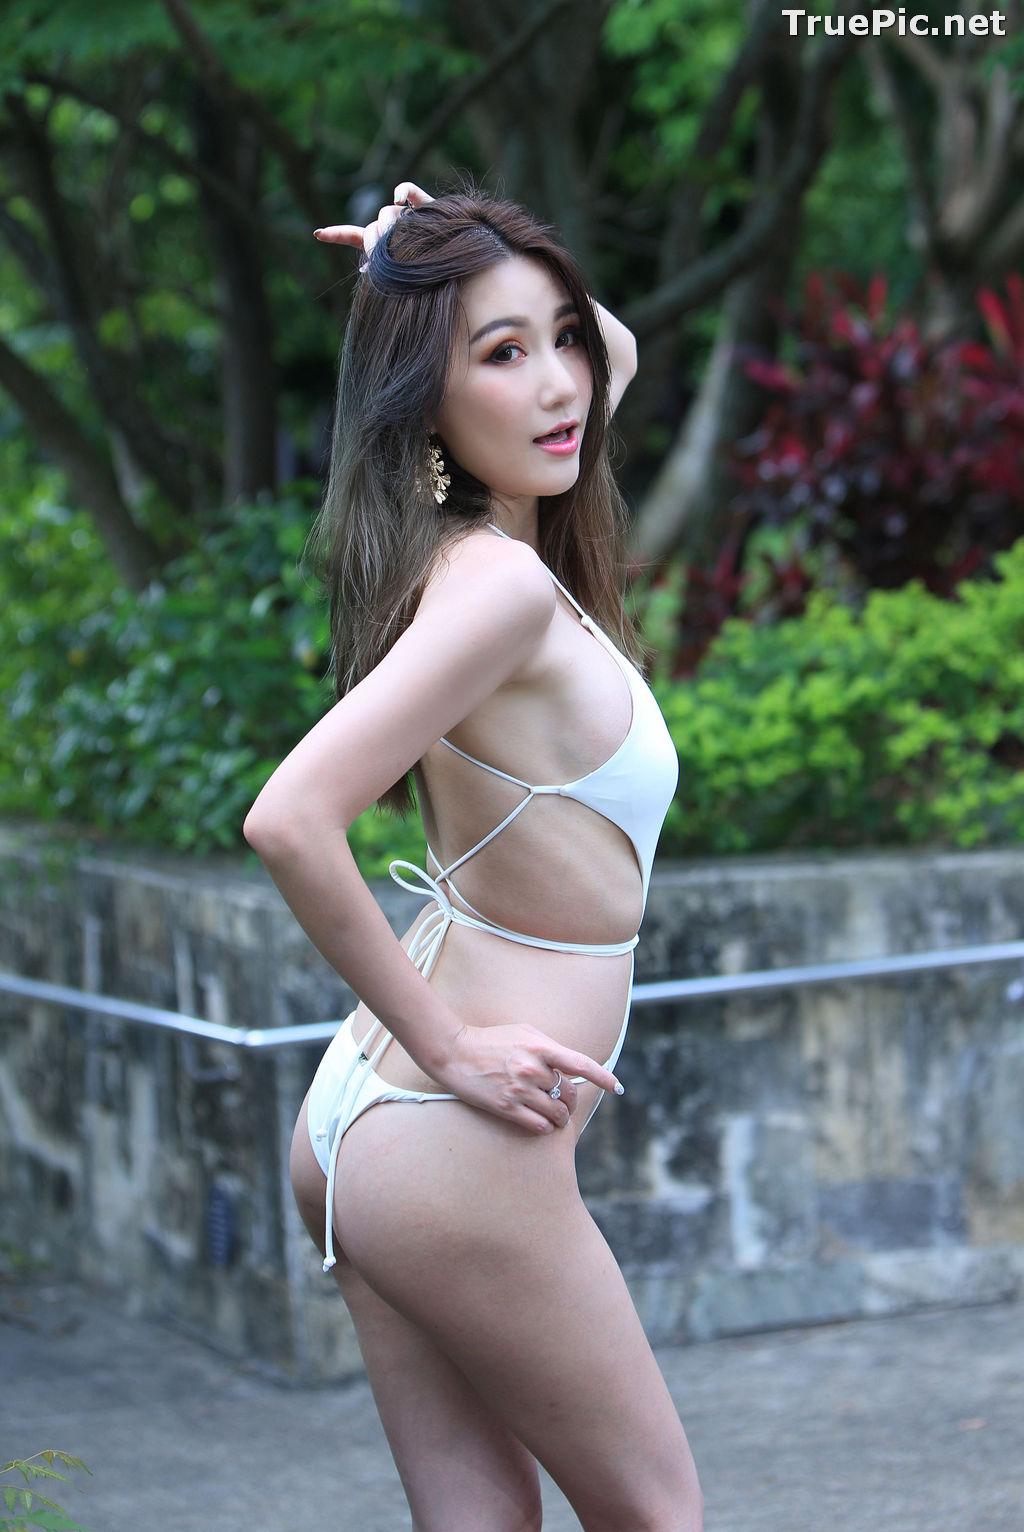 Image Taiwanese Beautiful Model - Suki - White Sexy Bikini Girl - TruePic.net - Picture-6